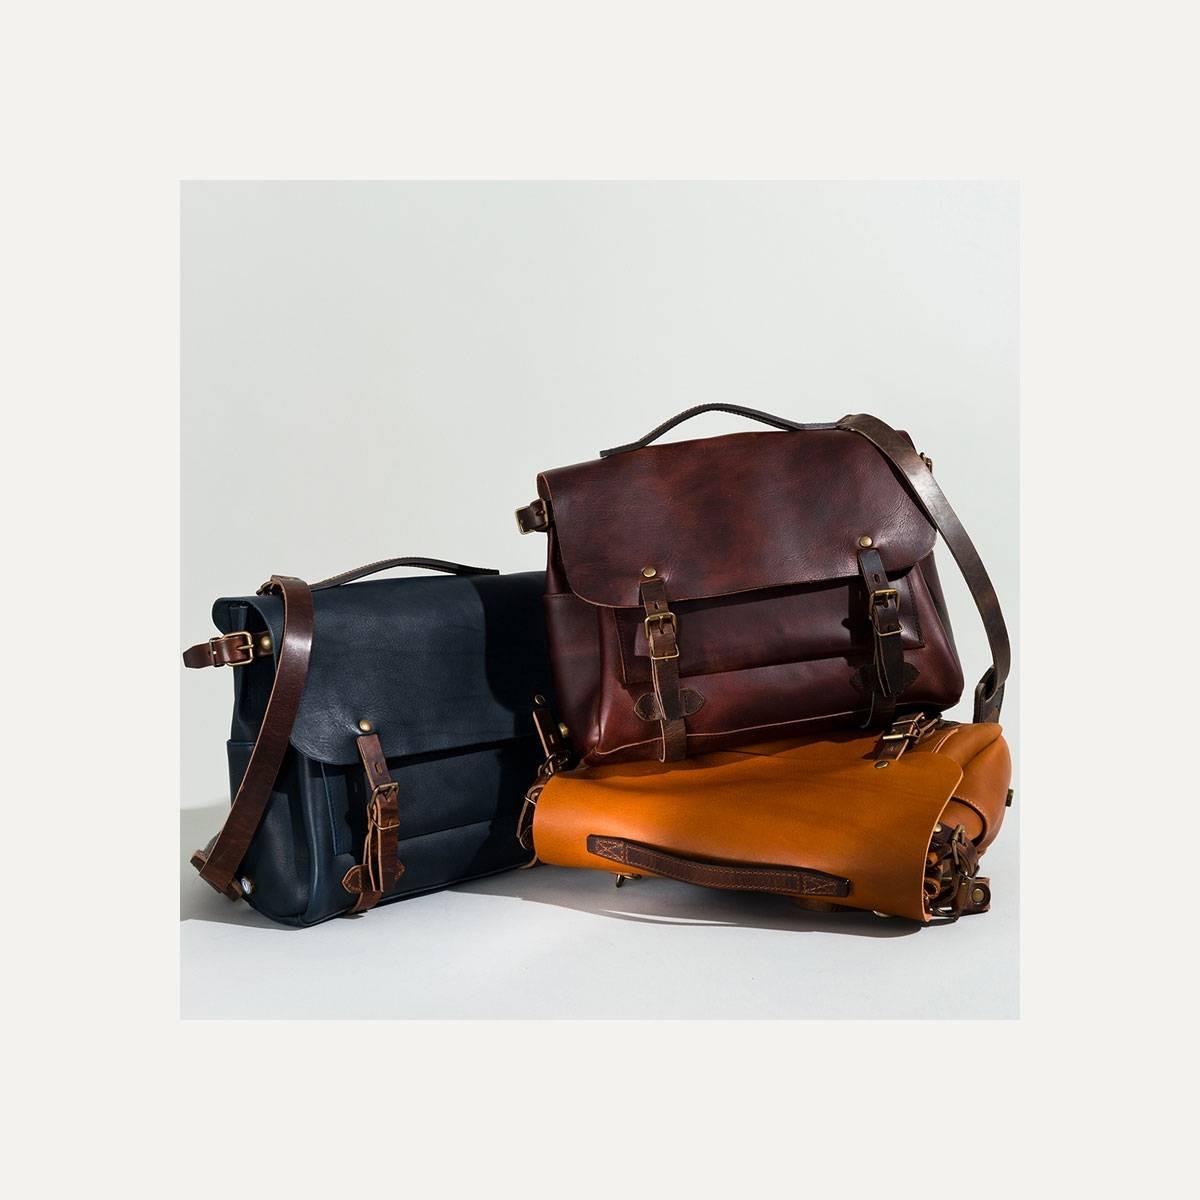 Postman bag Eclair M - Pain brulé  (image n°8)